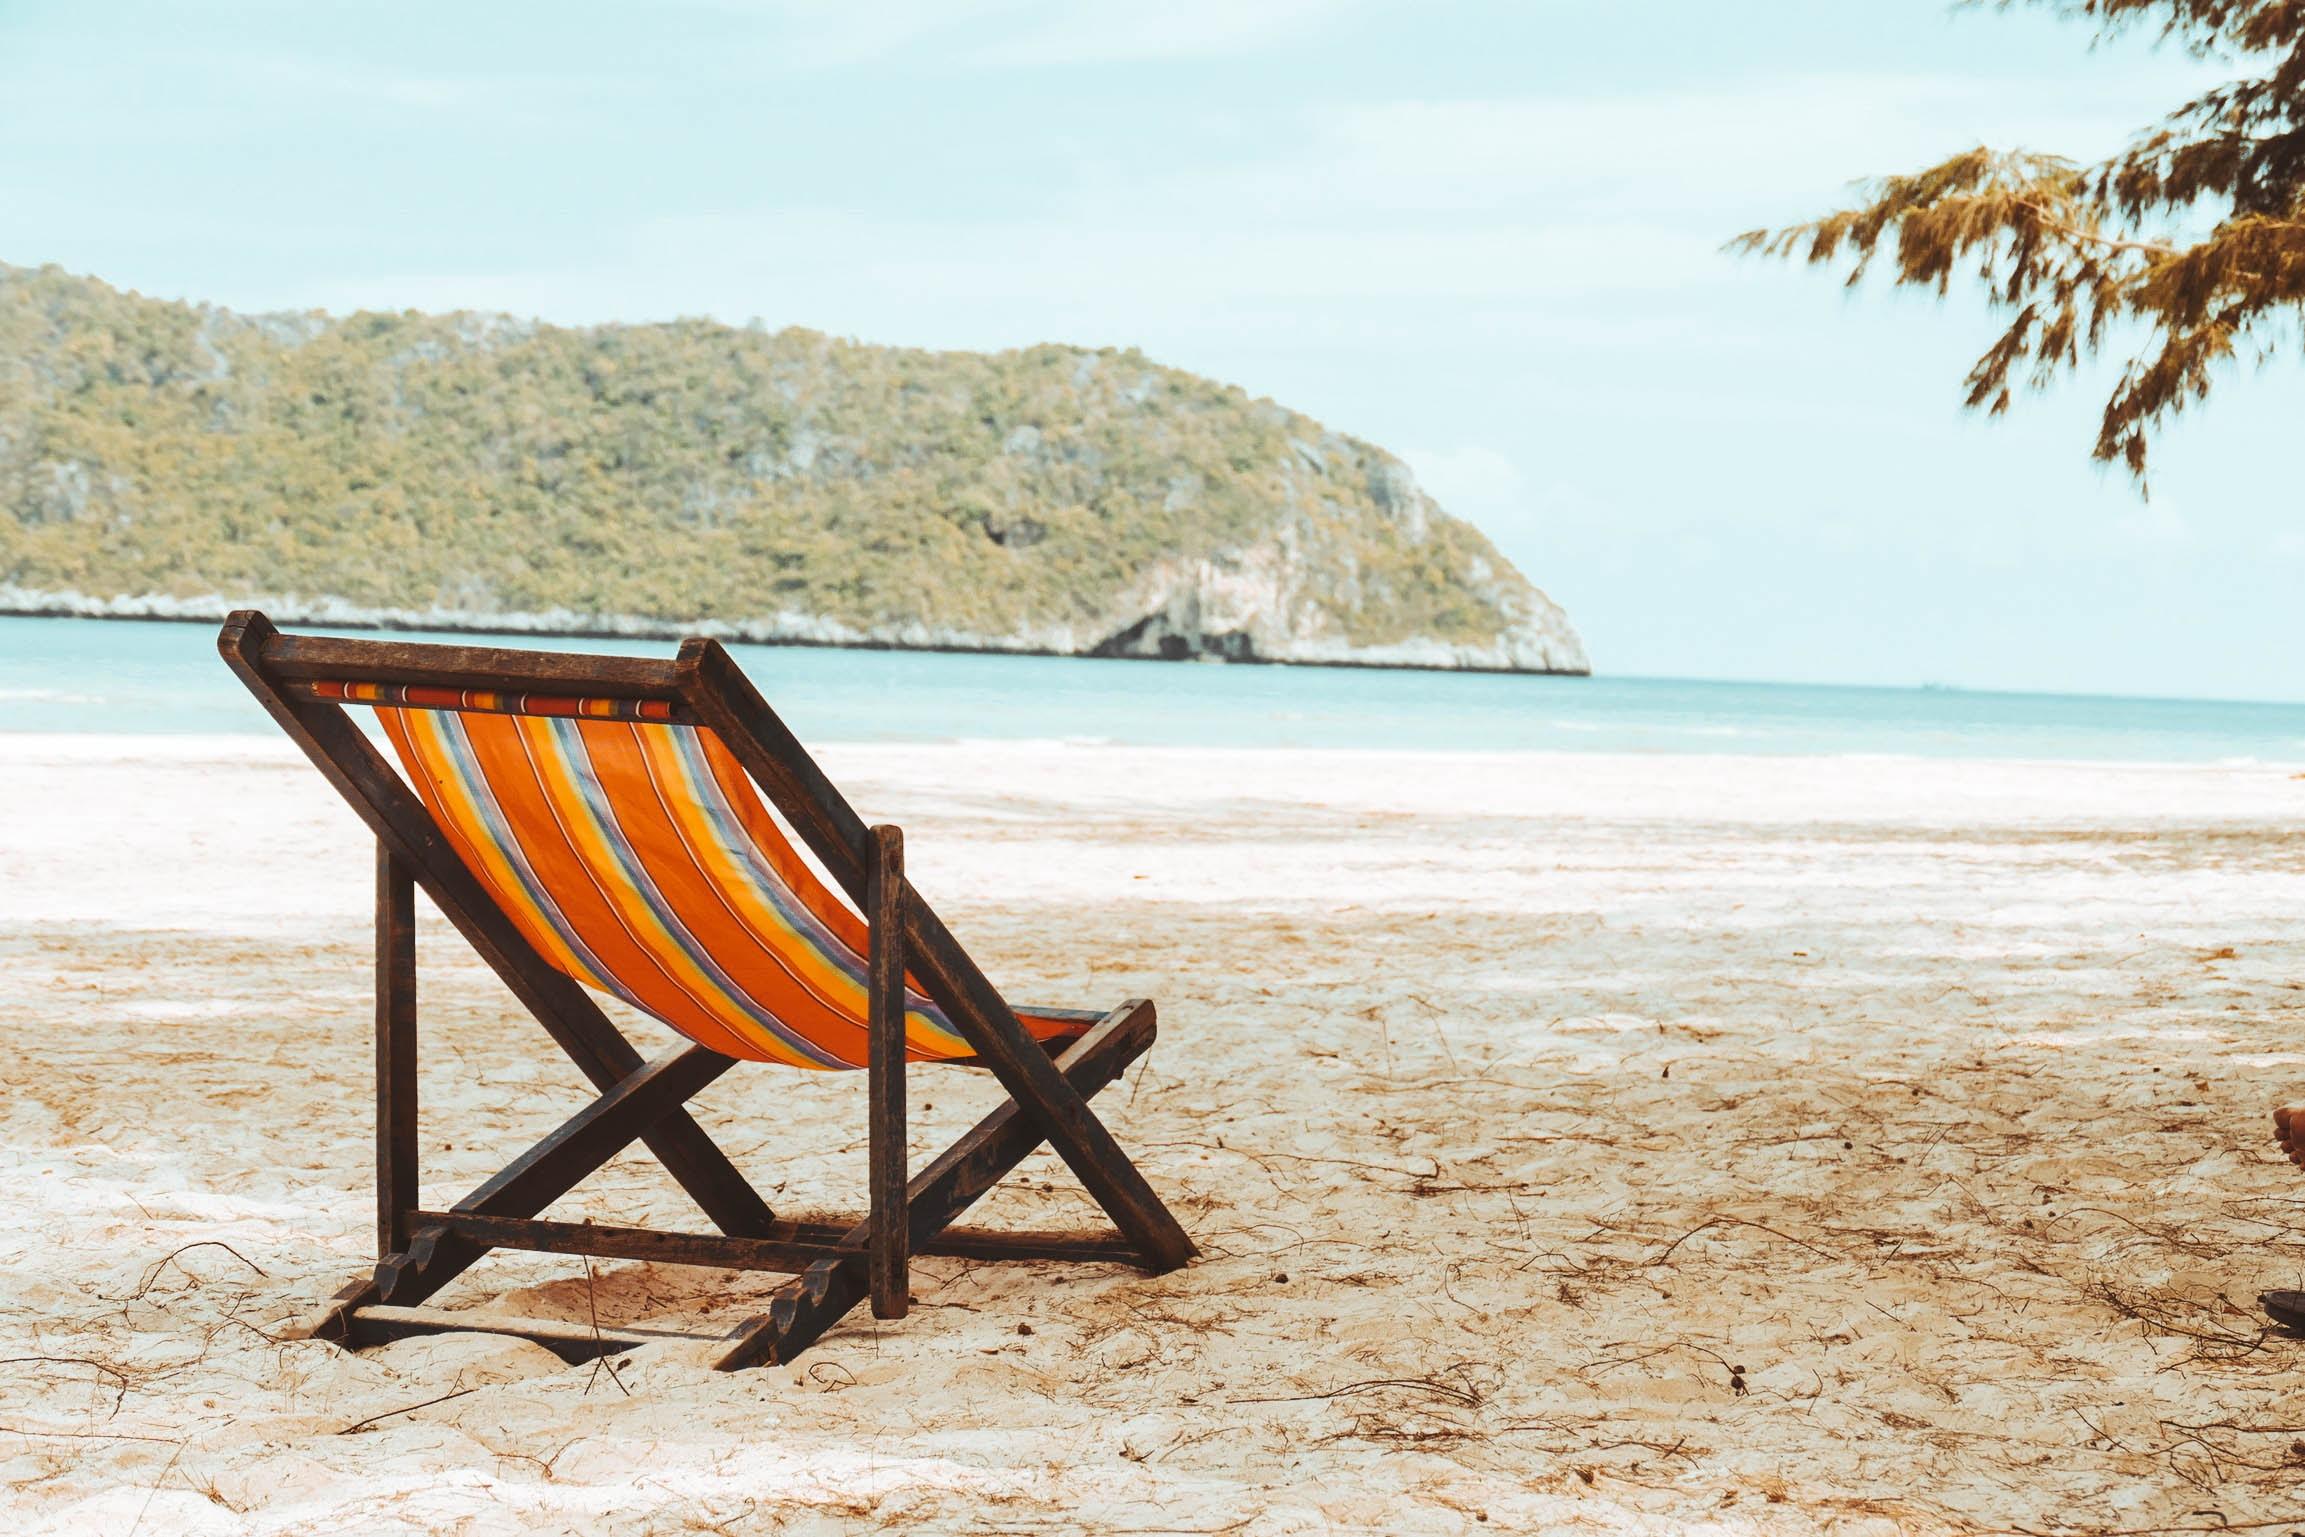 photo of lounge chair on beach